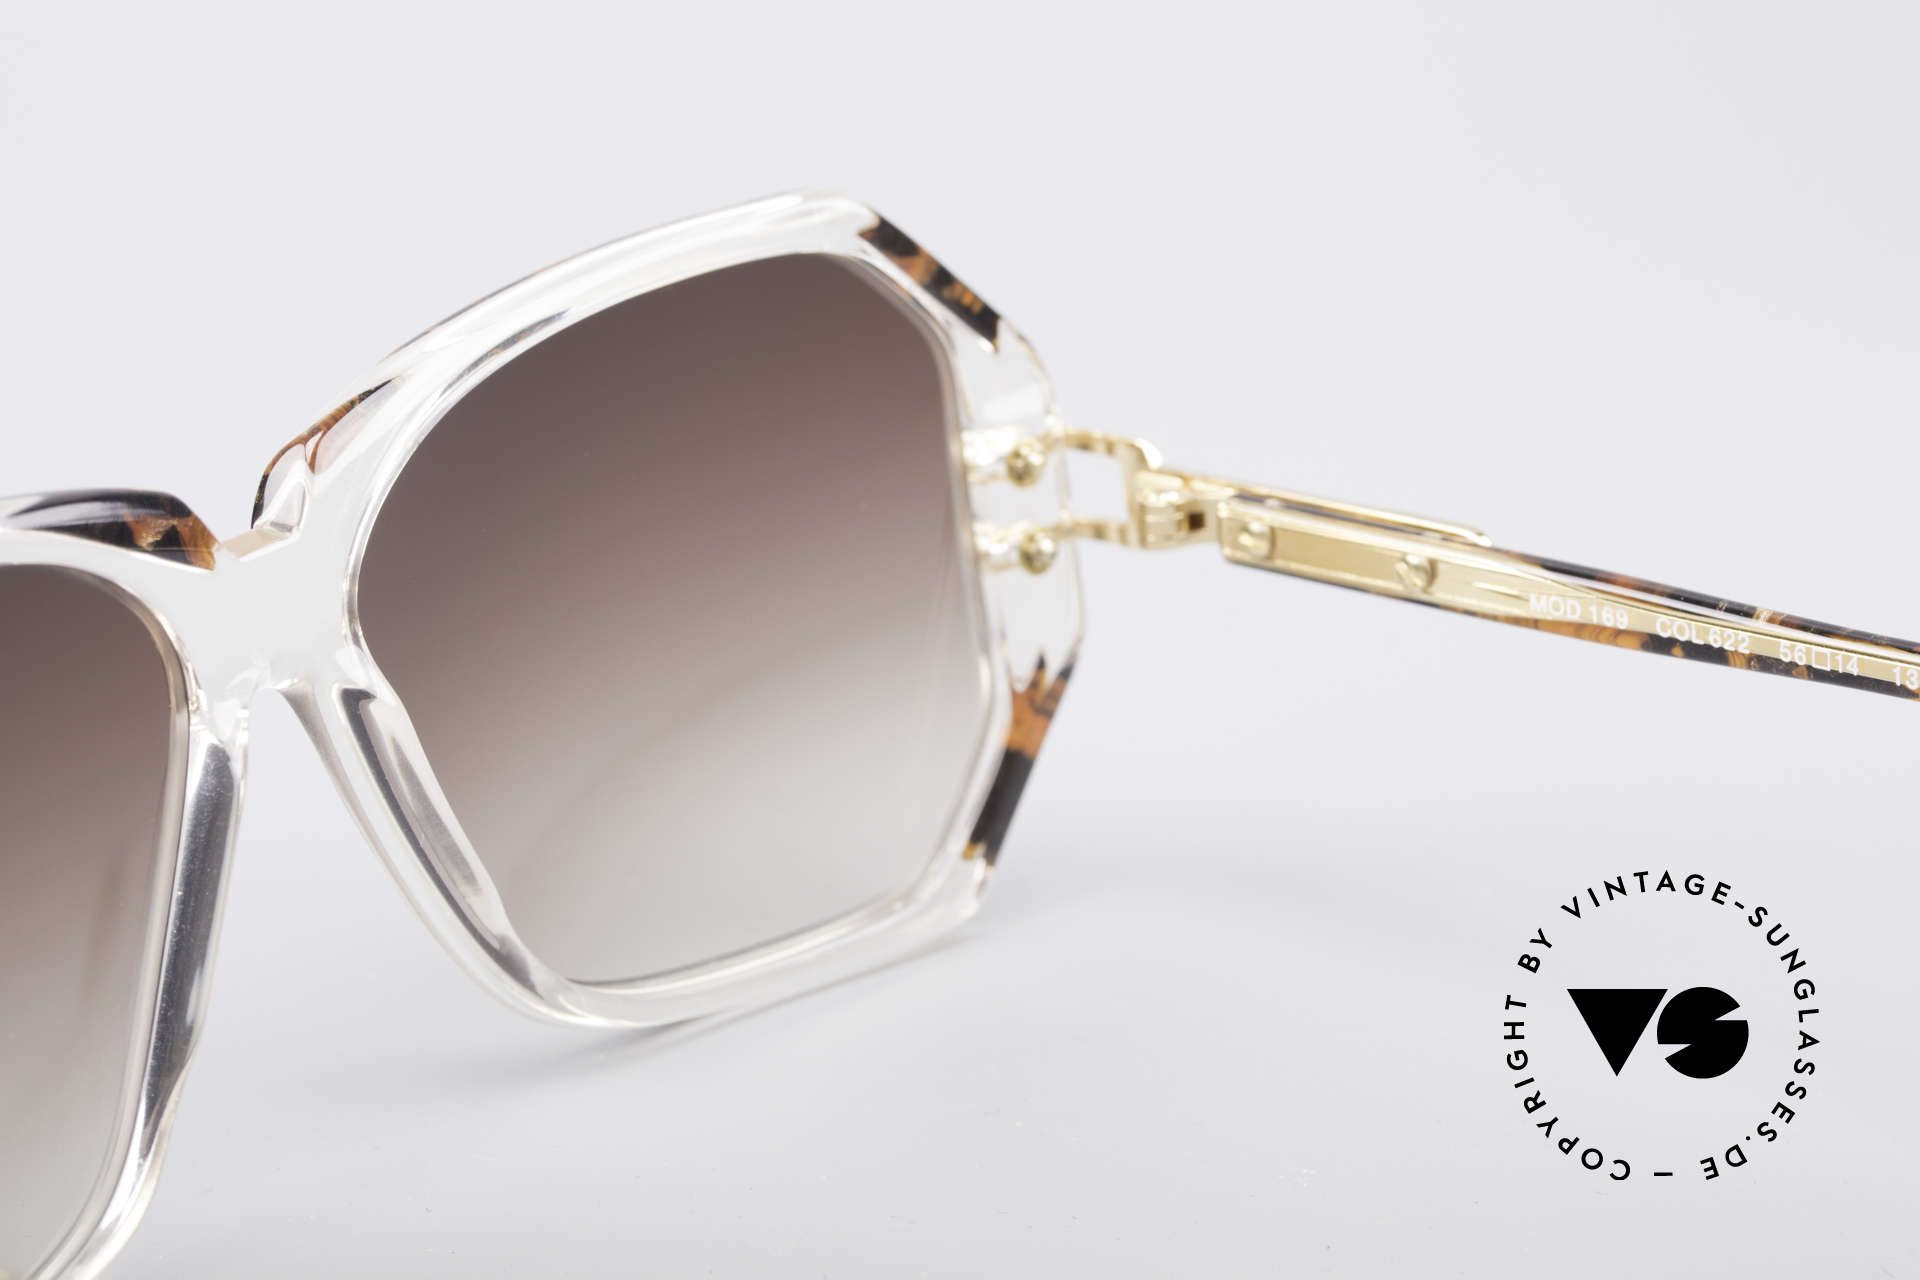 Cazal 169 Vintage Designer Shades, brown-gradient sun lenses for 100% UV protection, Made for Women